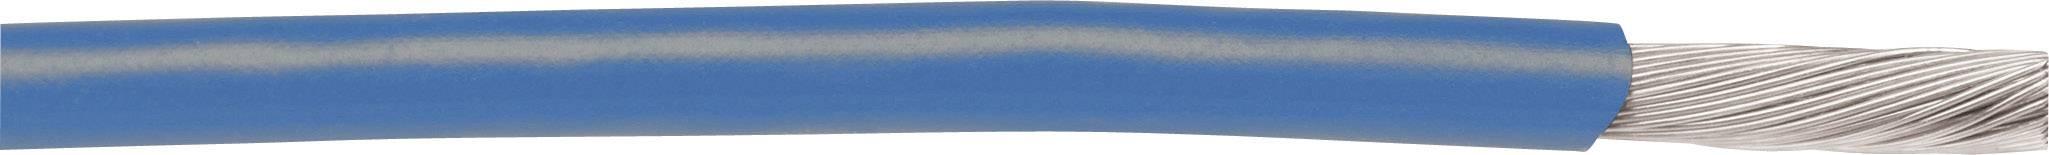 Pletenica EcoWire 1 x 0.08 mm, modra AlphaWire 6710 30.5 m